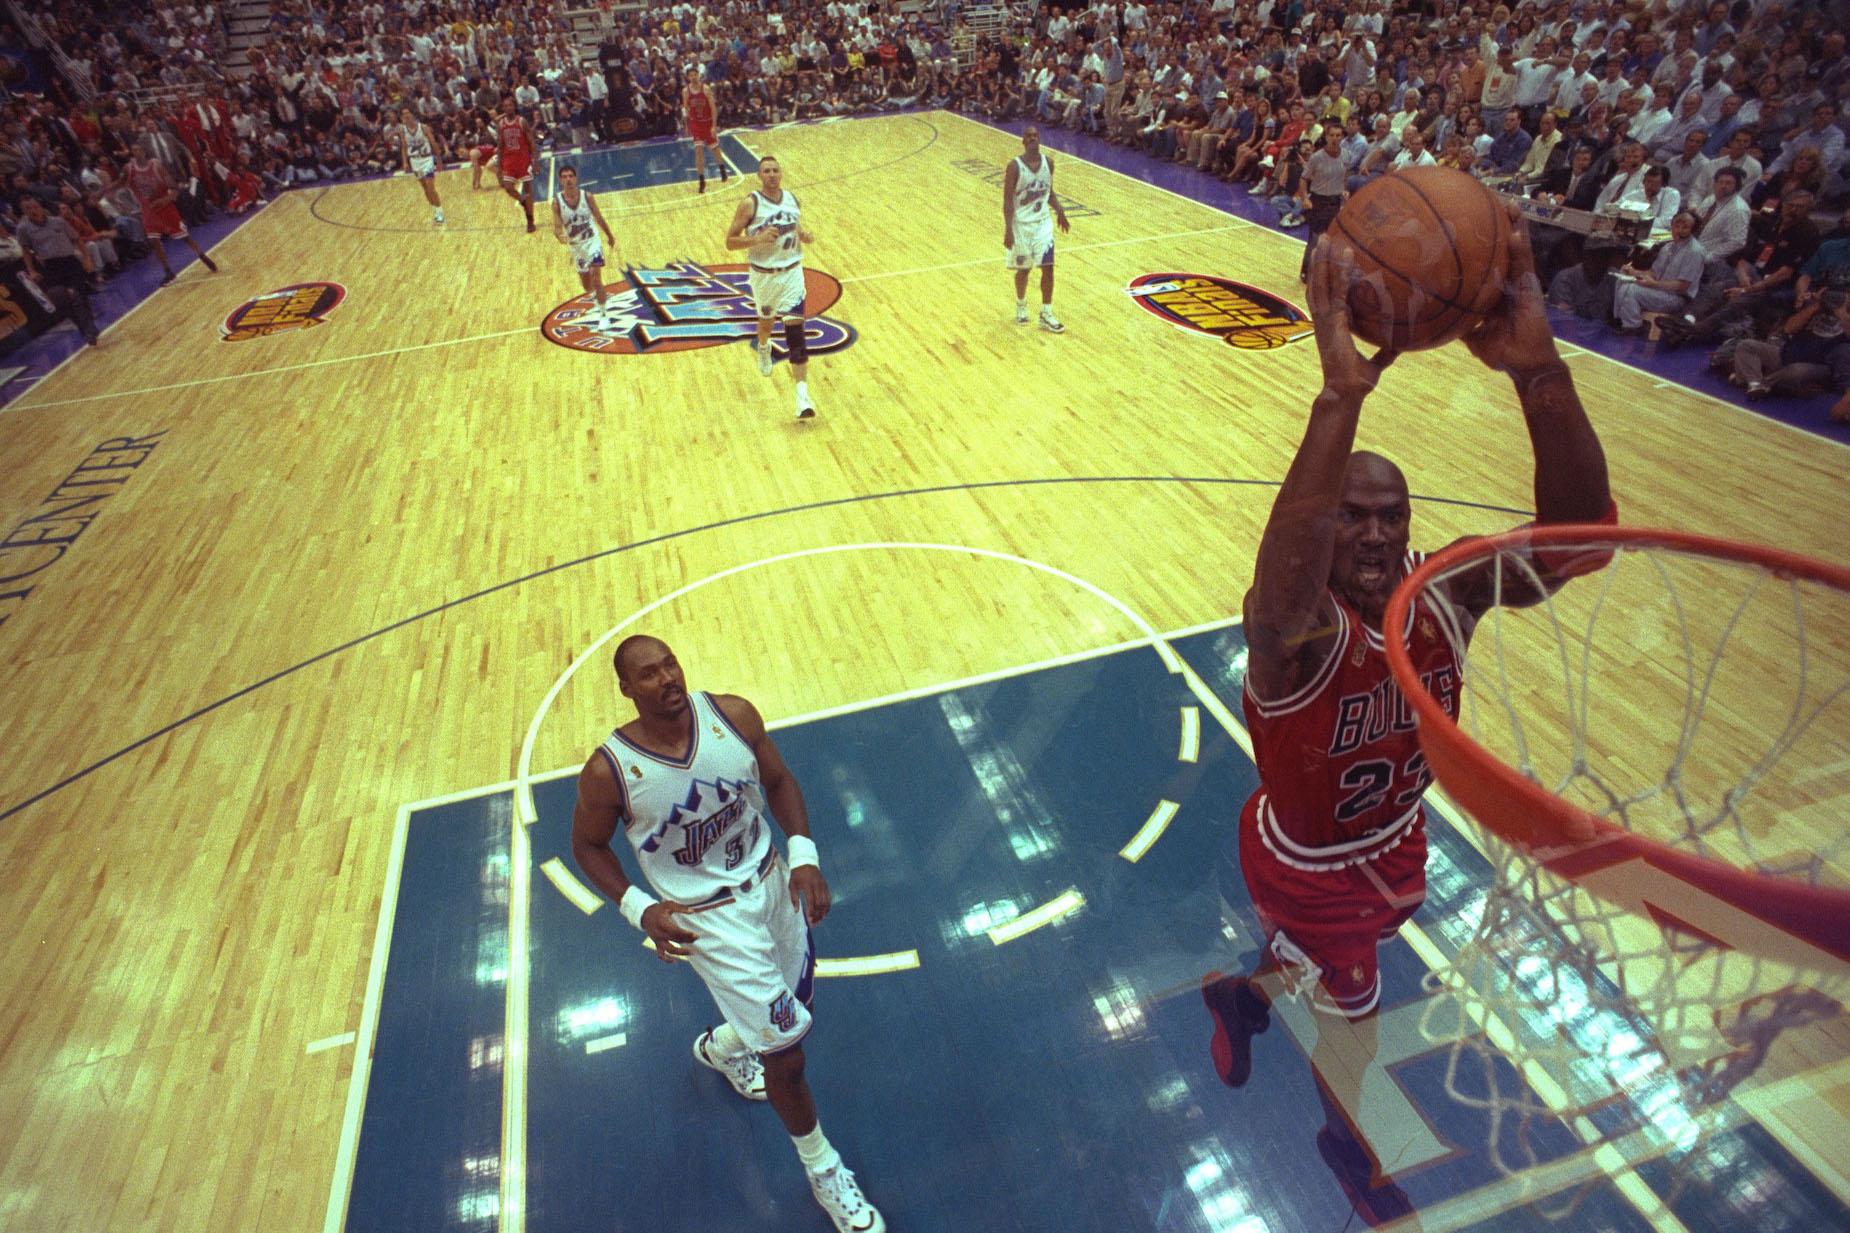 Michael Jordan dunks against the Utah Jazz in 1997.